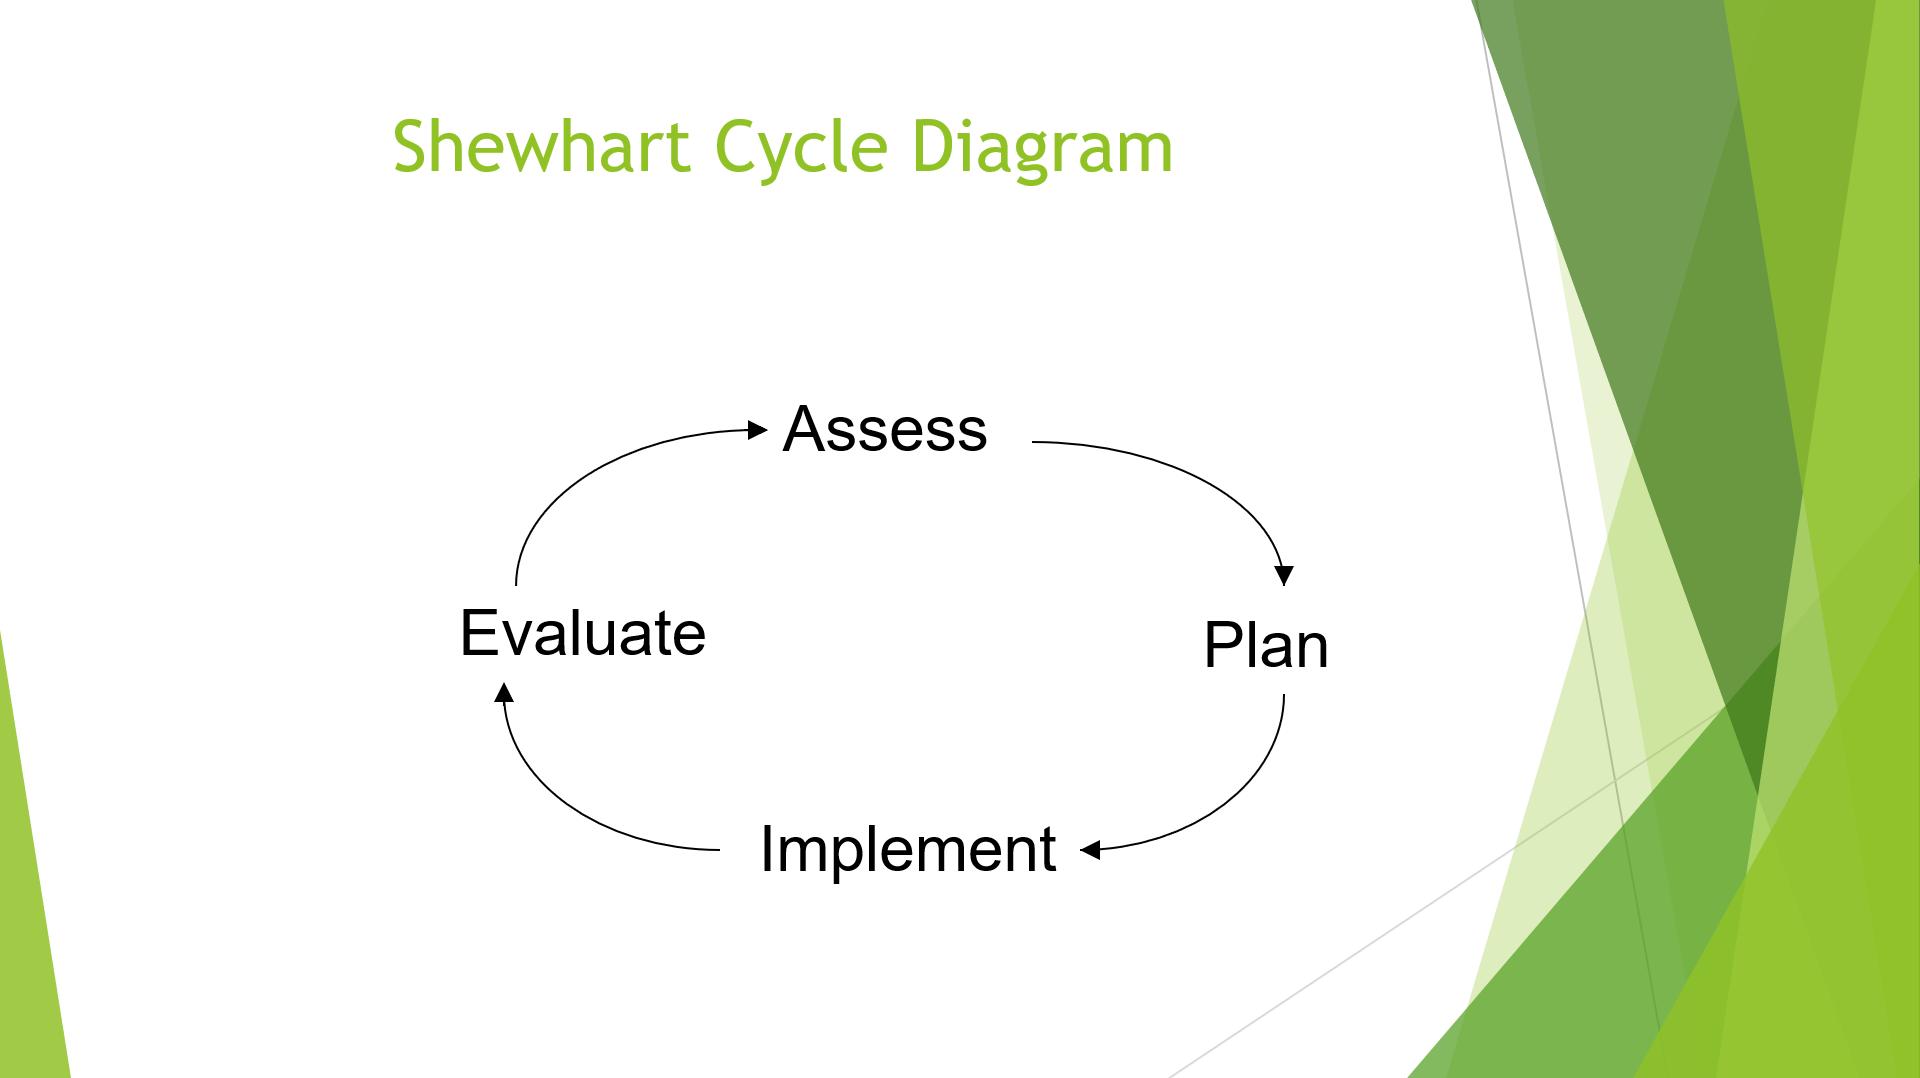 202107.15 Shewhart cycle